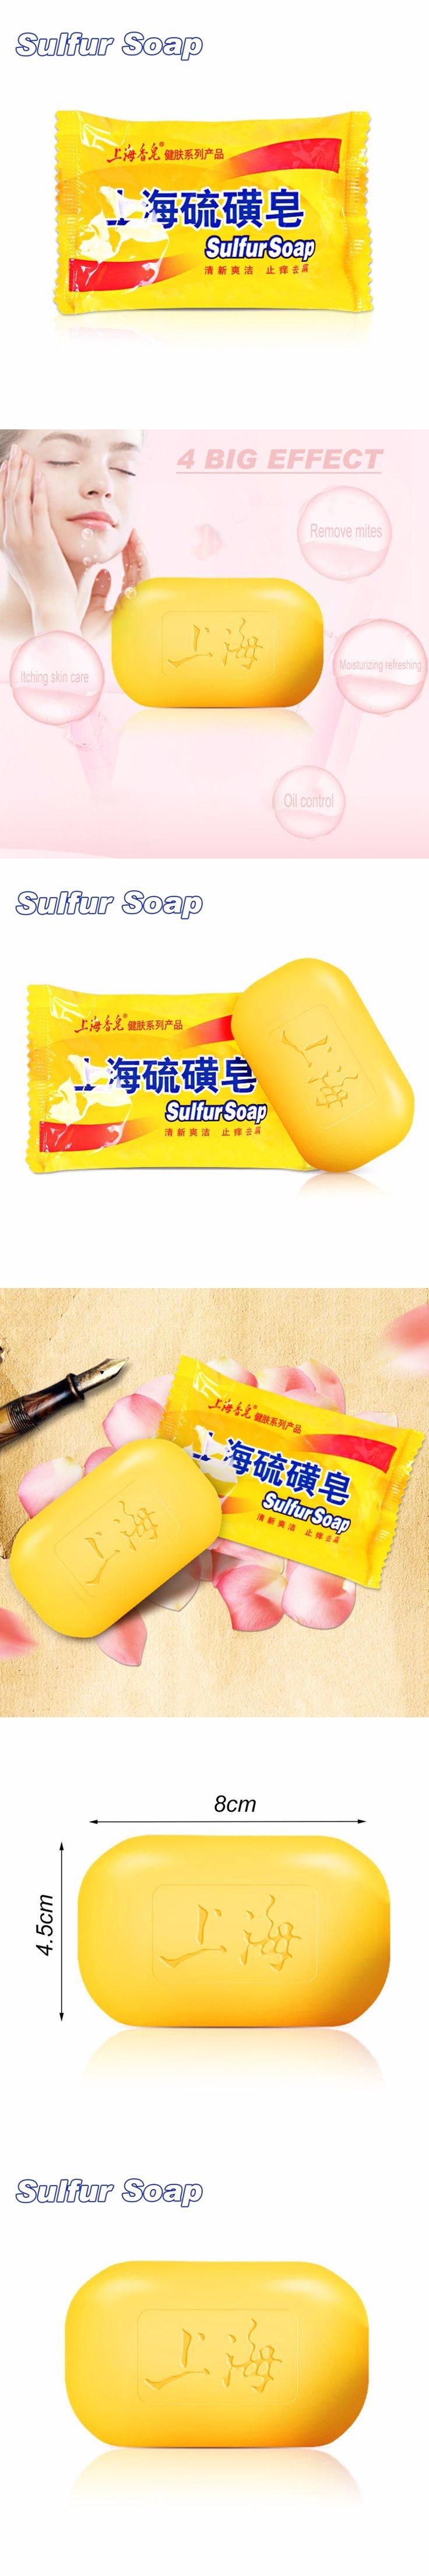 Universal Body Care Skin Cleaning Bathing Sulfur Soap Drug Bactericidal For Acne Psoriasis Seborrheic Eczema Antifungal